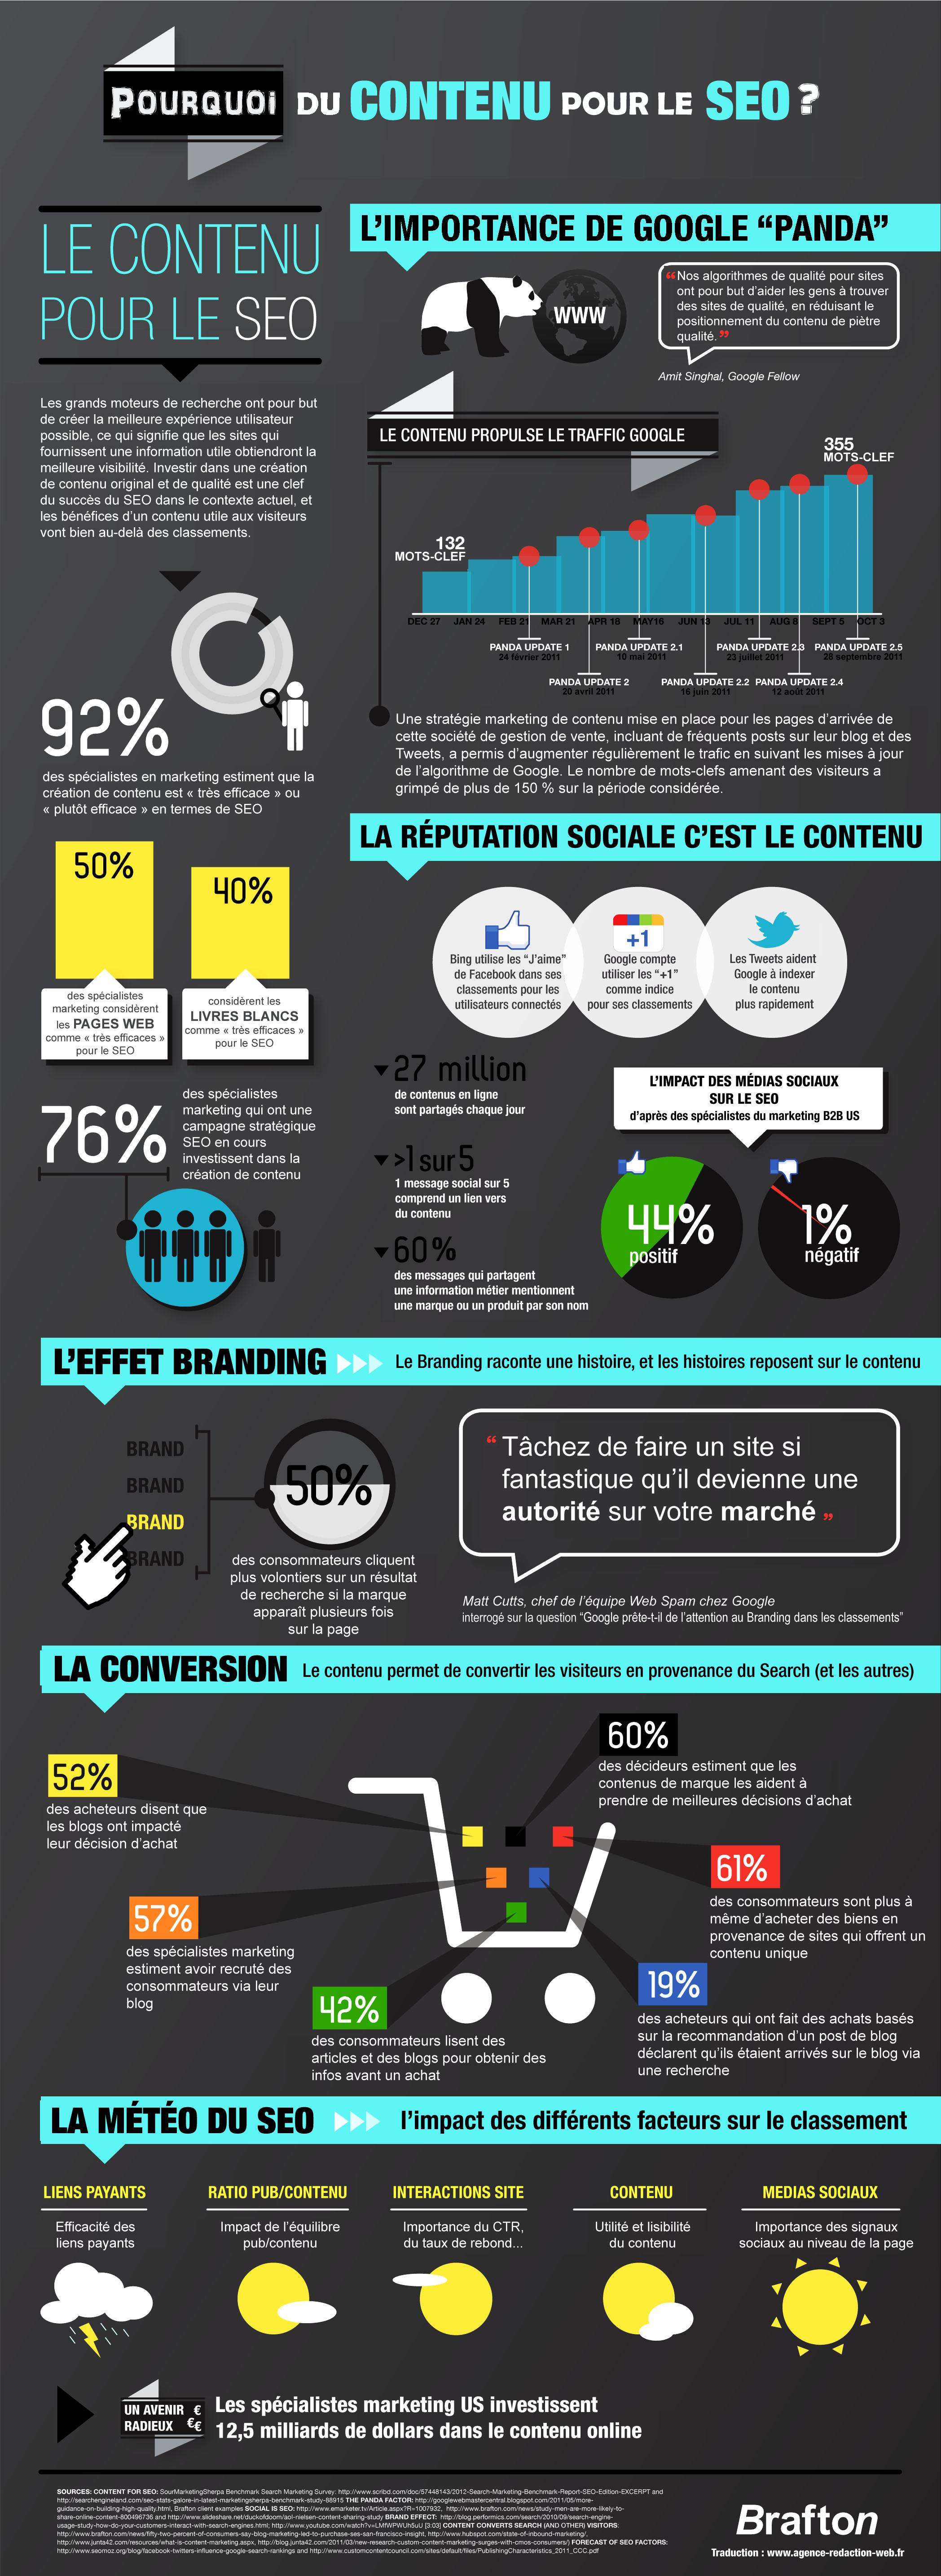 http://www.agence-redaction-web.fr/files/6313/2739/9134/InfographieContenuRedactionnelWeb.jpg